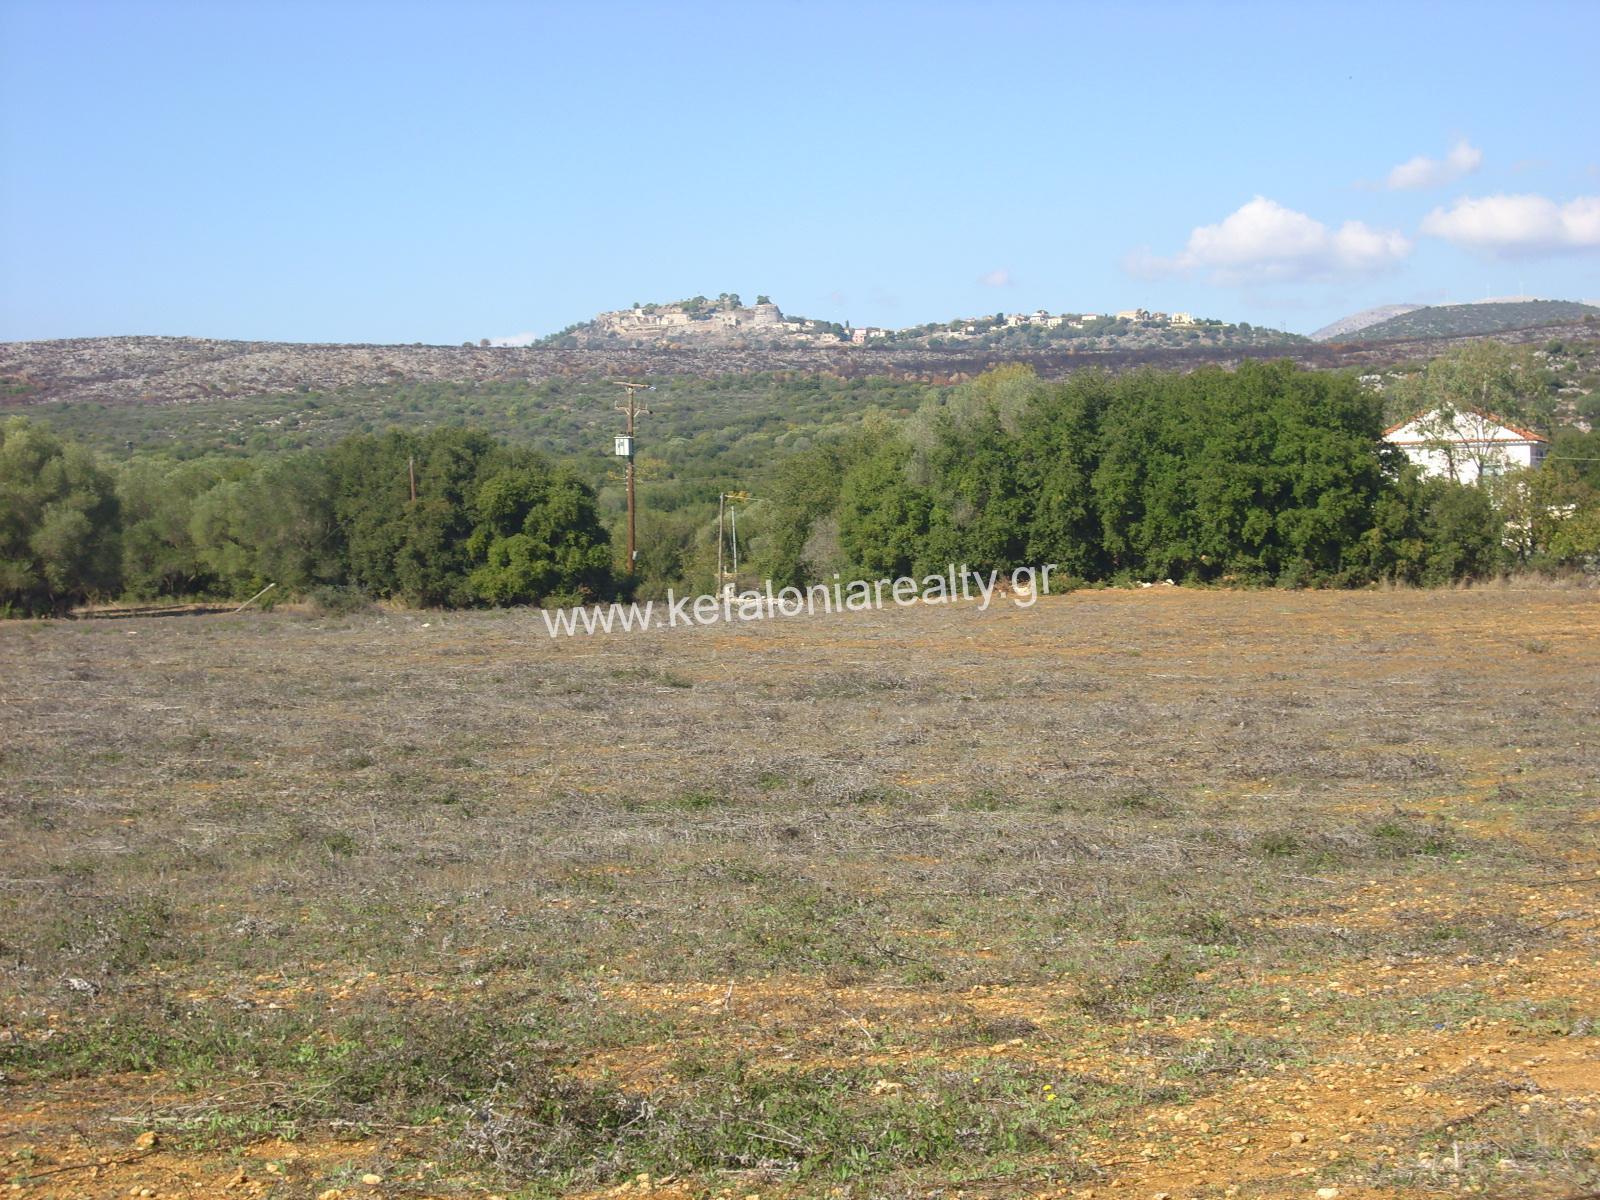 Land For Sale In Keramies